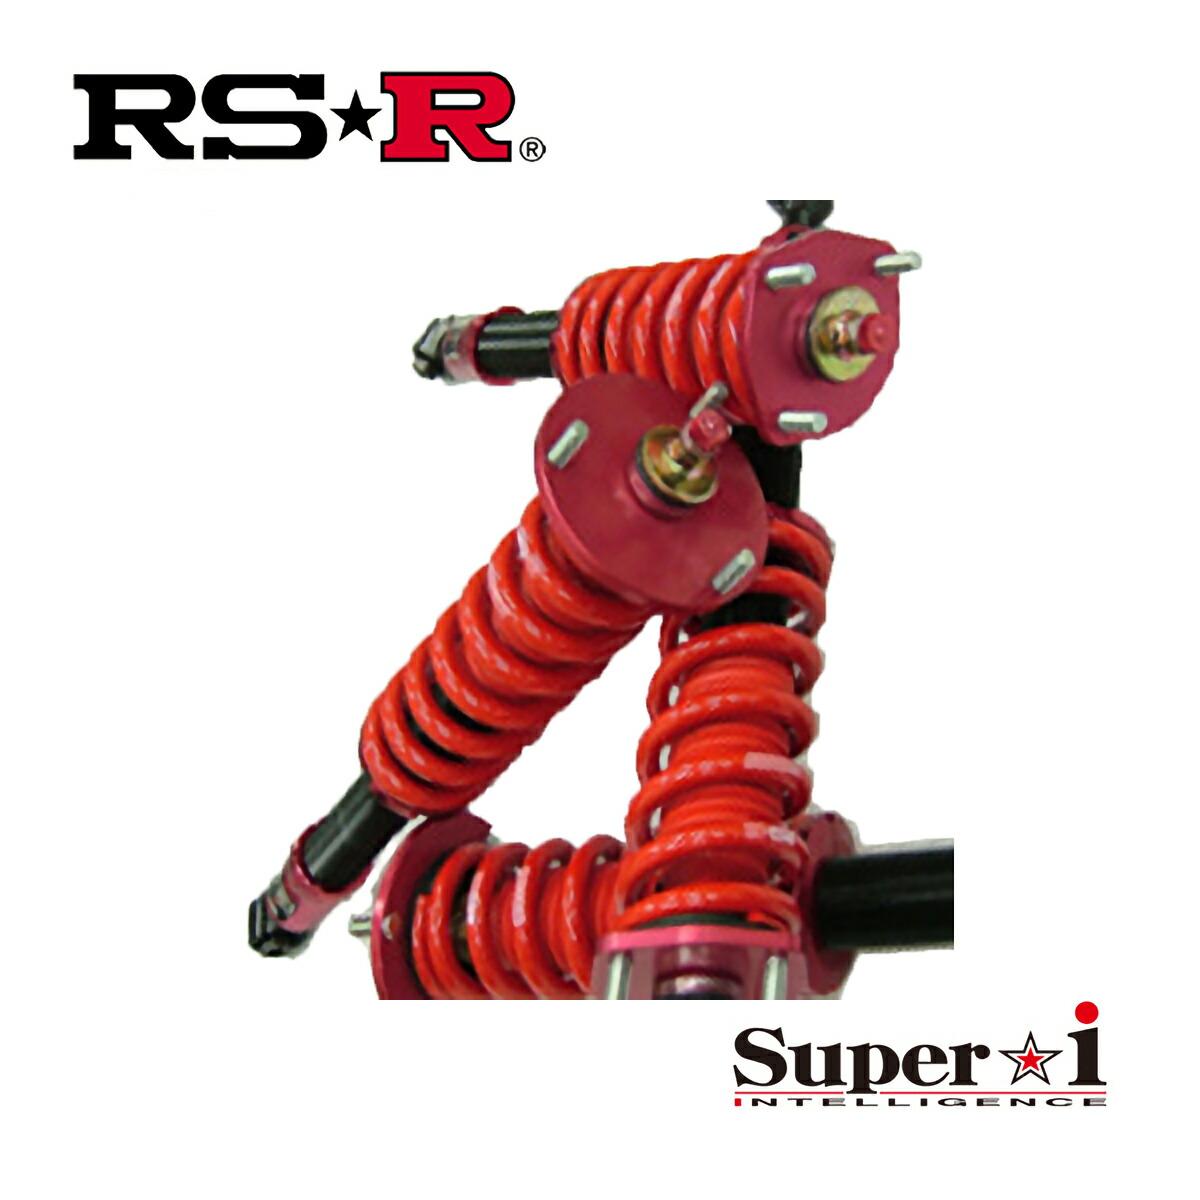 RS-R GS450h Fスポーツ GWL10 車高調 リア車高調整 ネジ式 SIT174M RSR スーパーi RSR 個人宅発送追金有